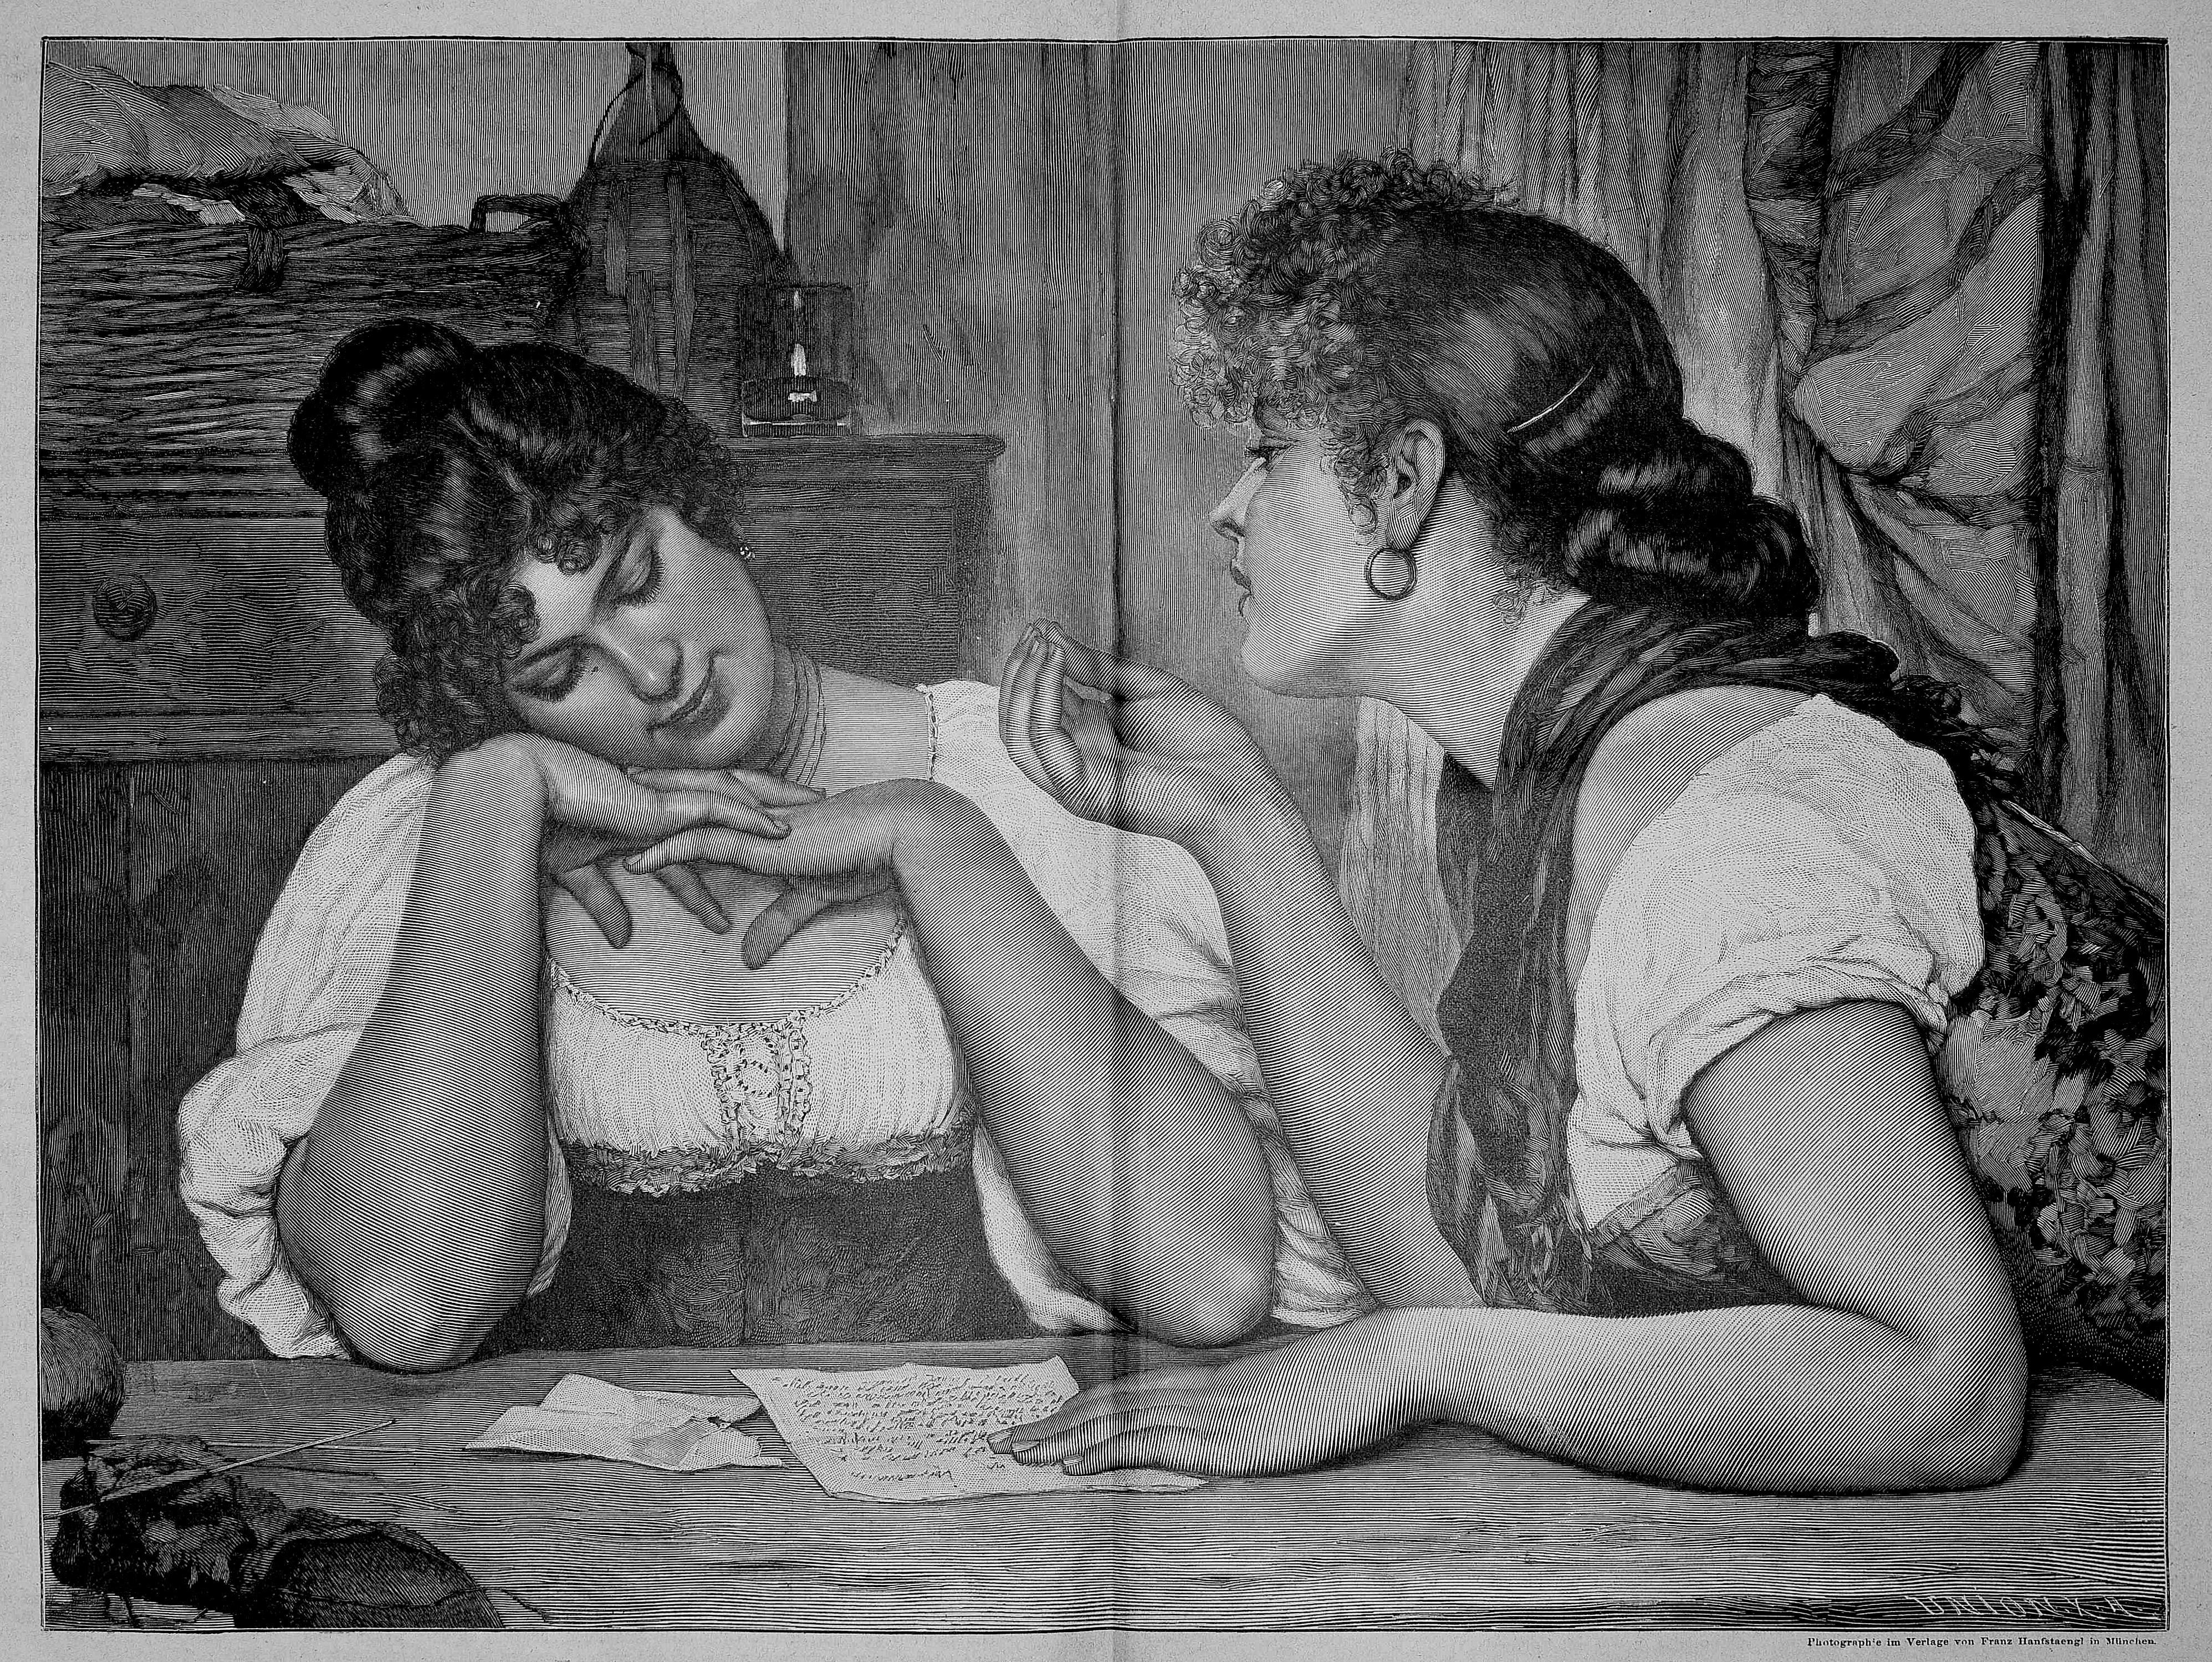 Die_Gartenlaube_(1893)_b_888